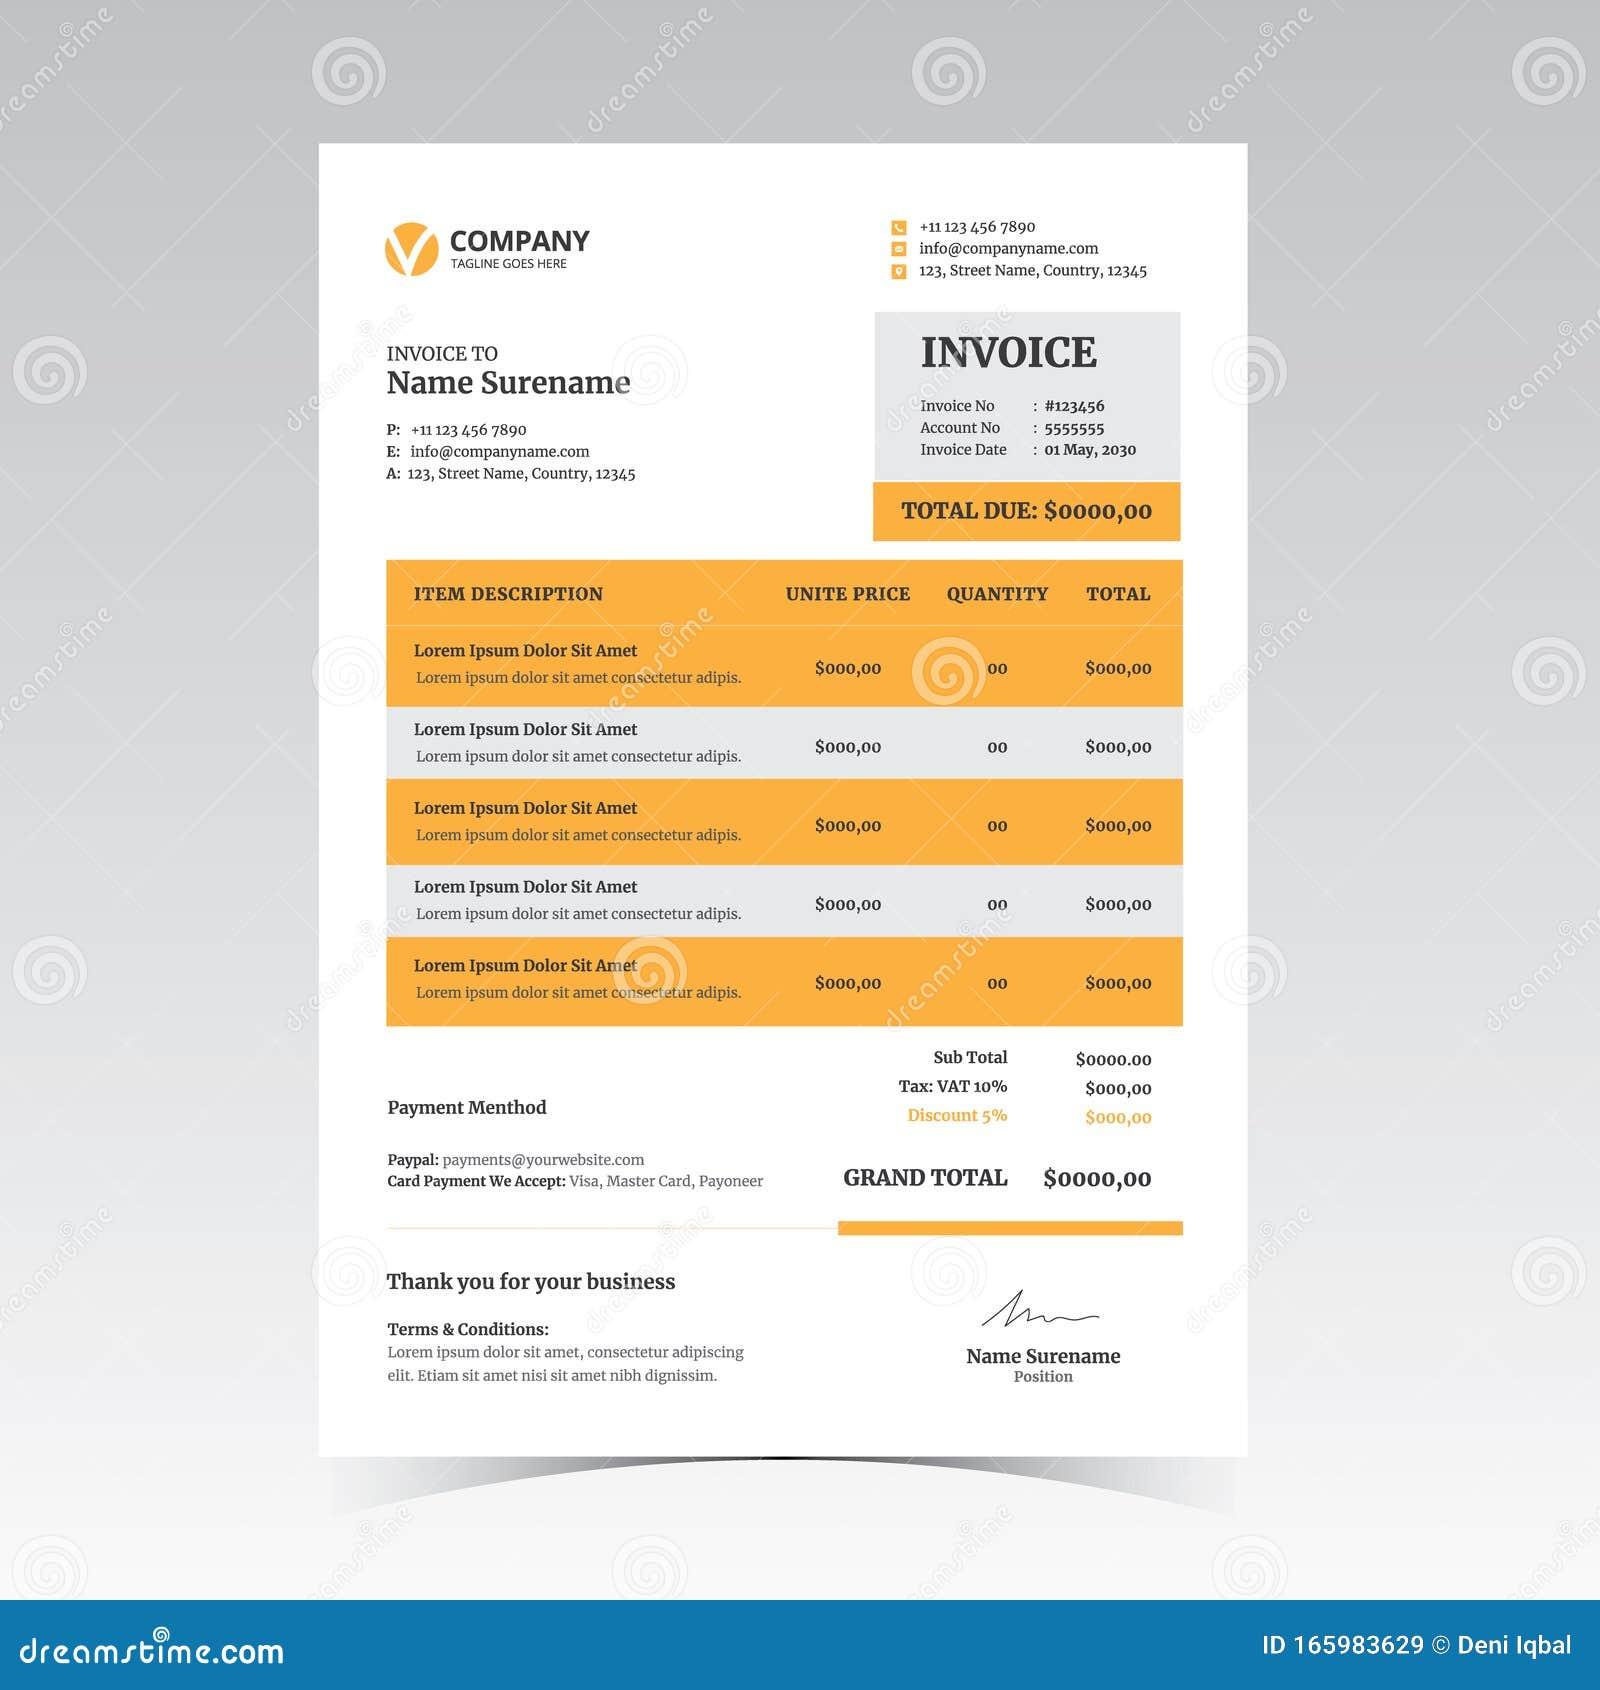 Modern Invoice Template Vector Design Stock Vector Illustration Of Template Branding 165983629